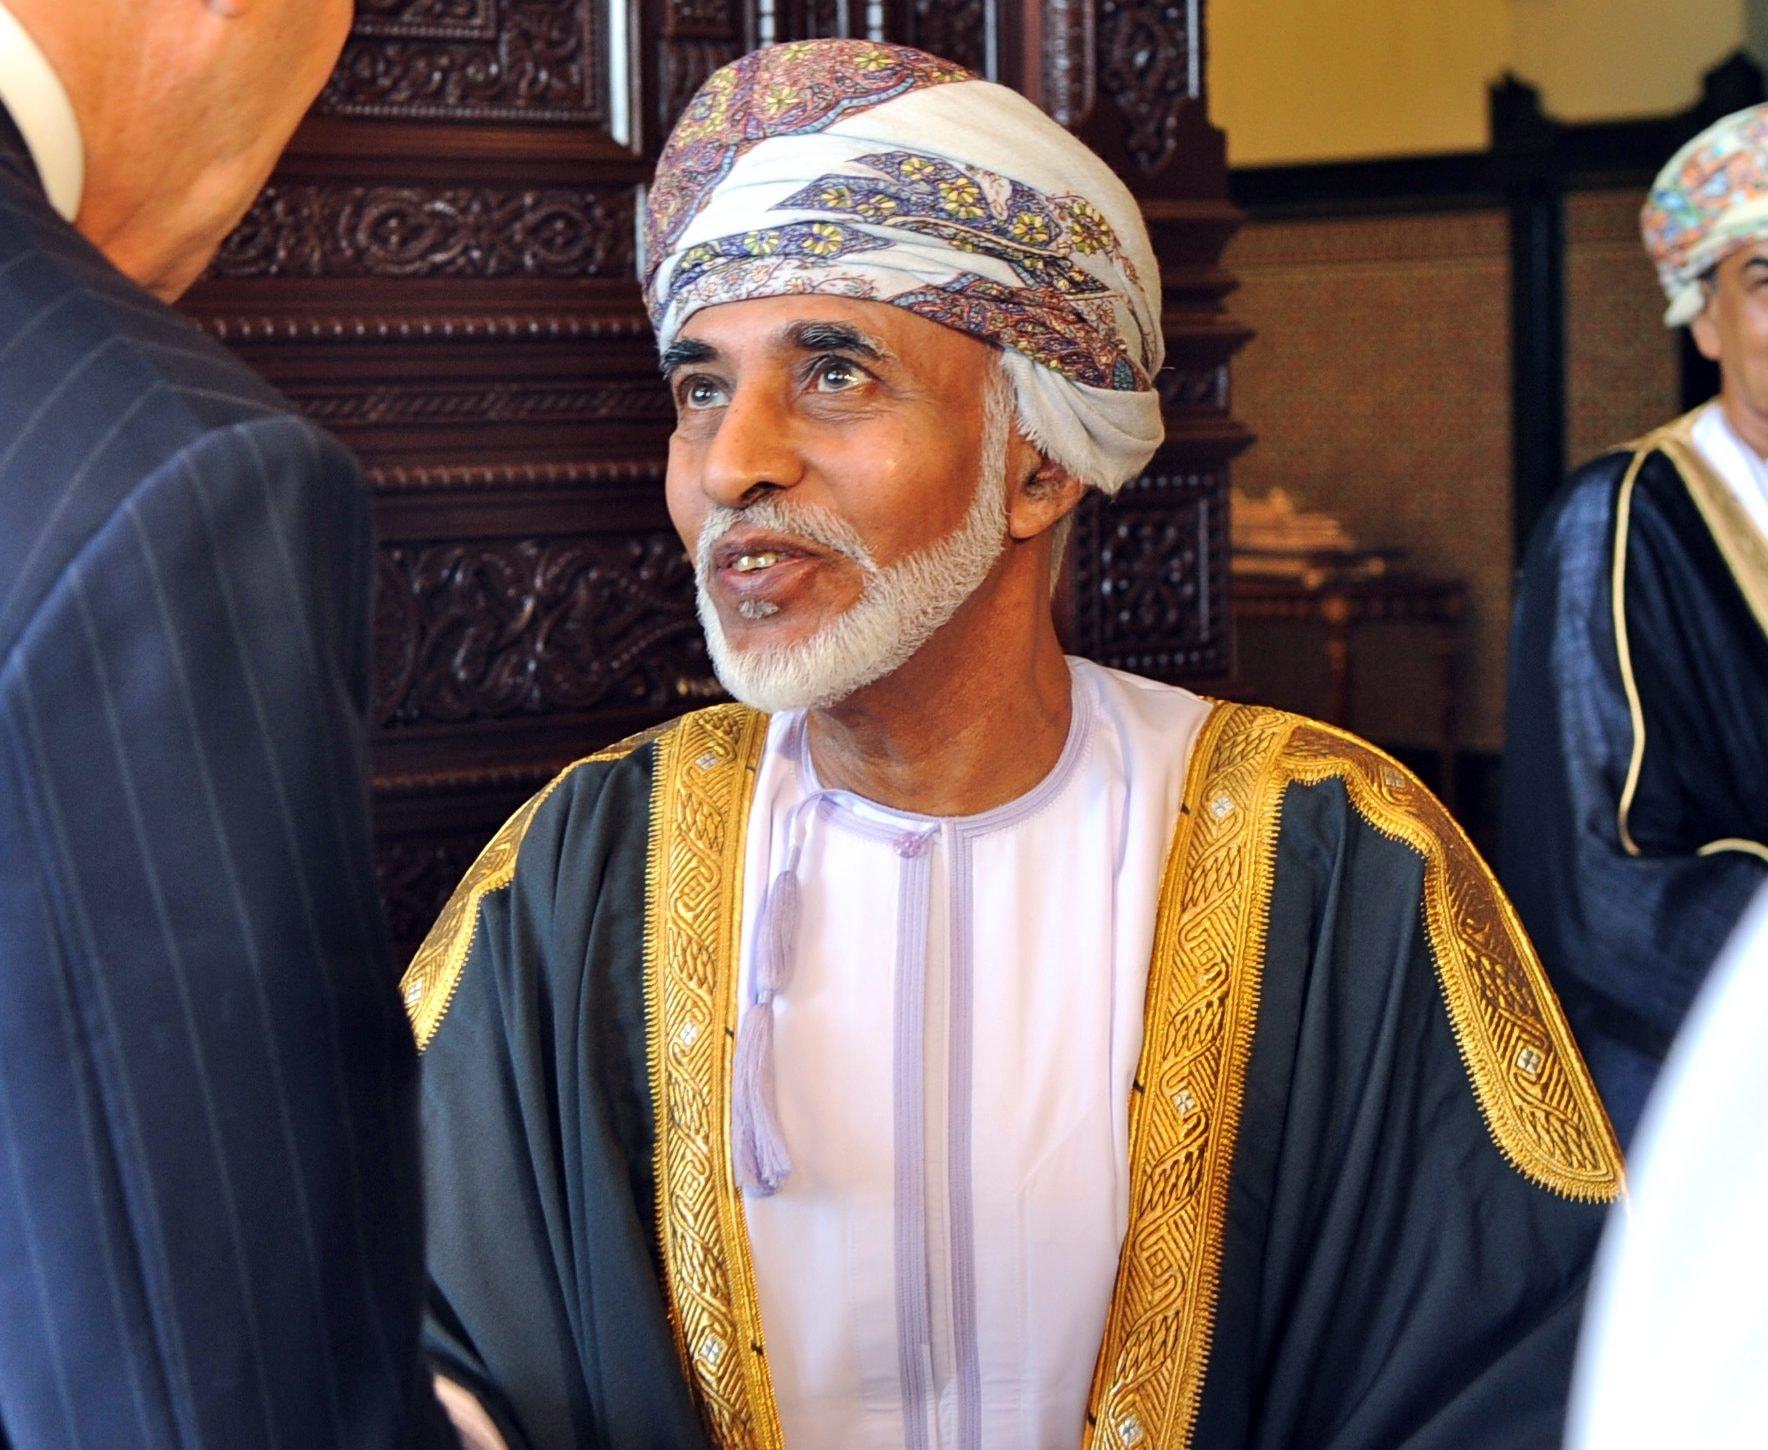 Qaboos bin Said al Said | © U.S. Department of State/WikiMedia